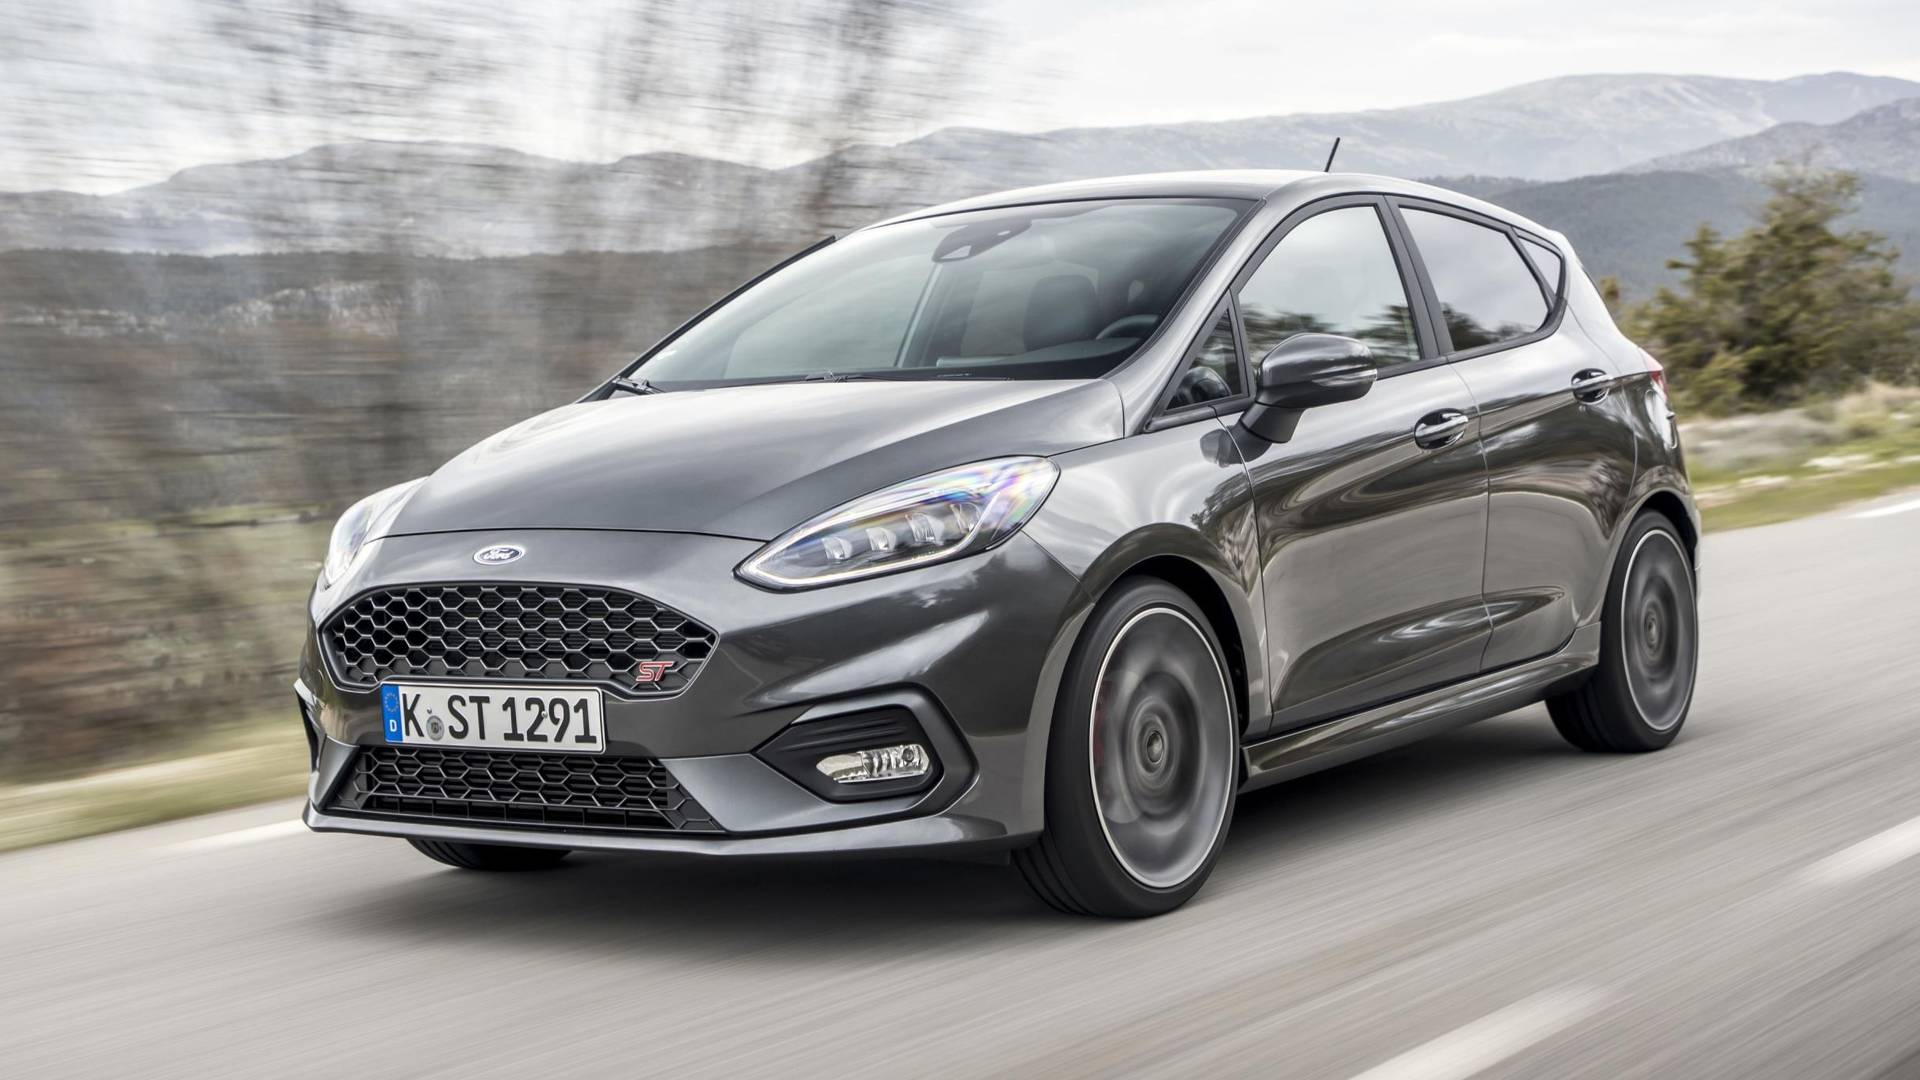 Ford Fiesta RS previsto para 2019 - Motores - SAPO